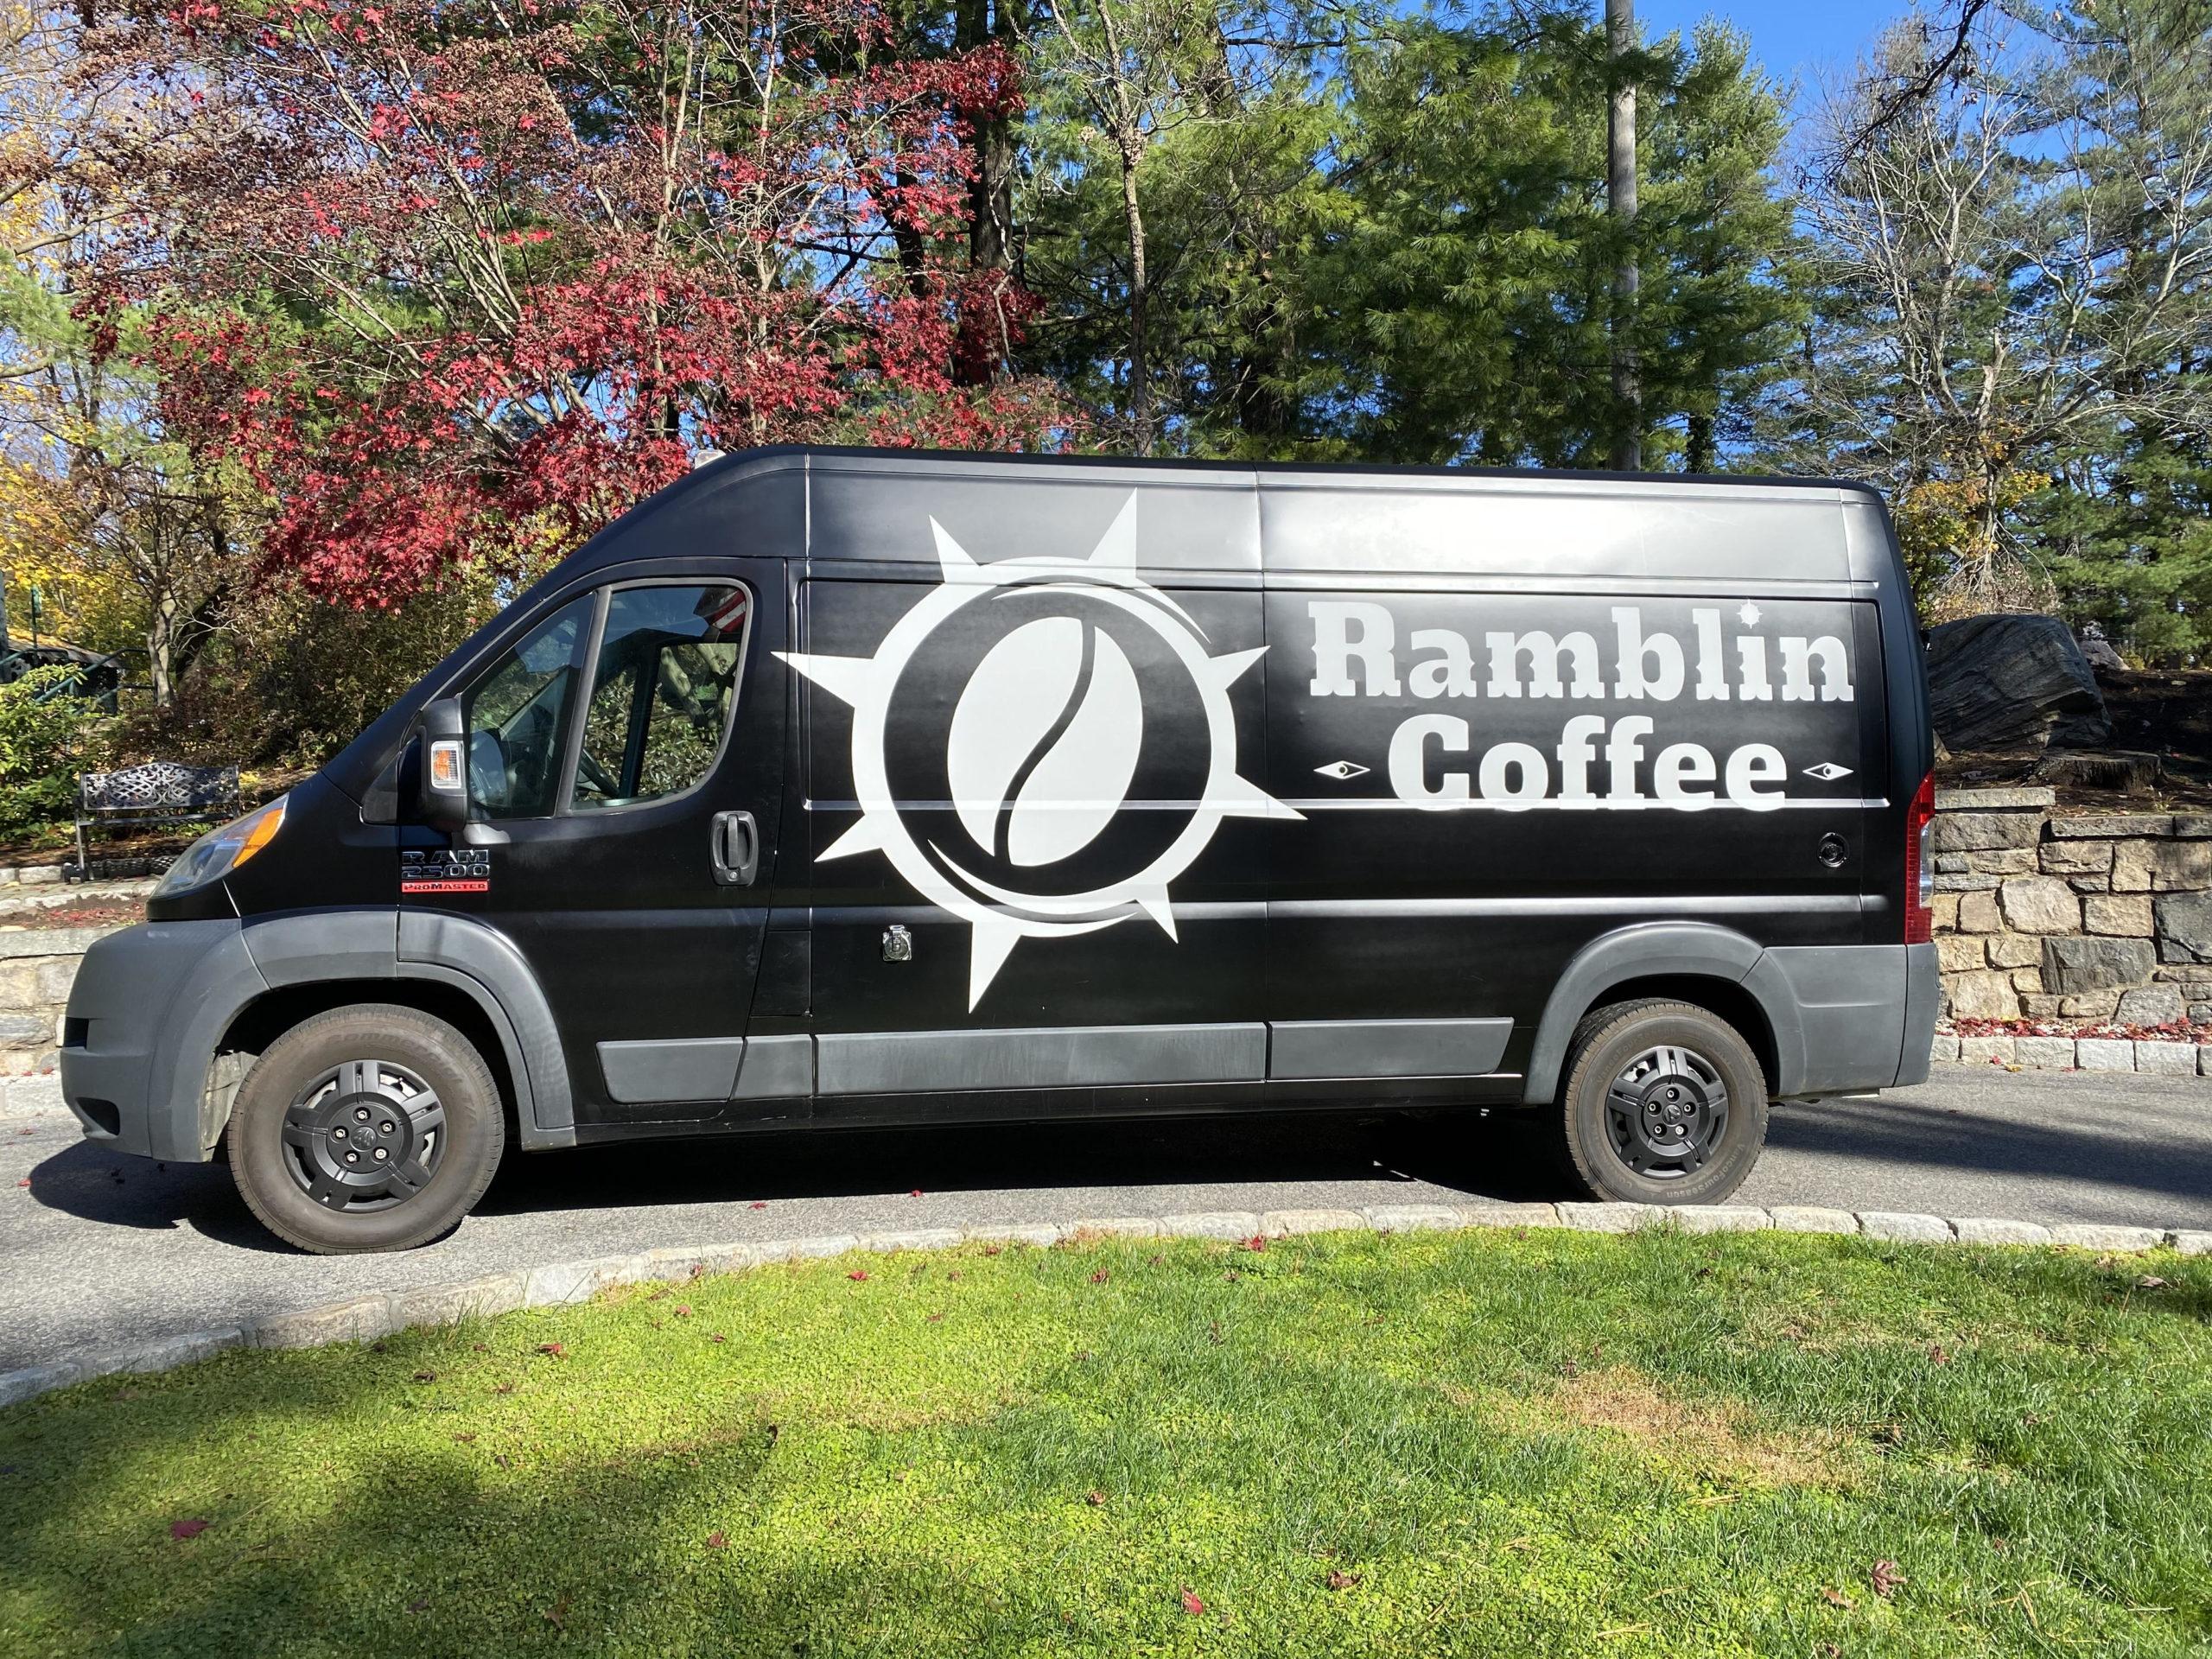 https://nyfta.org/wp-content/uploads/2021/04/ramblin-coffee-truck-catering-scaled-1.jpg